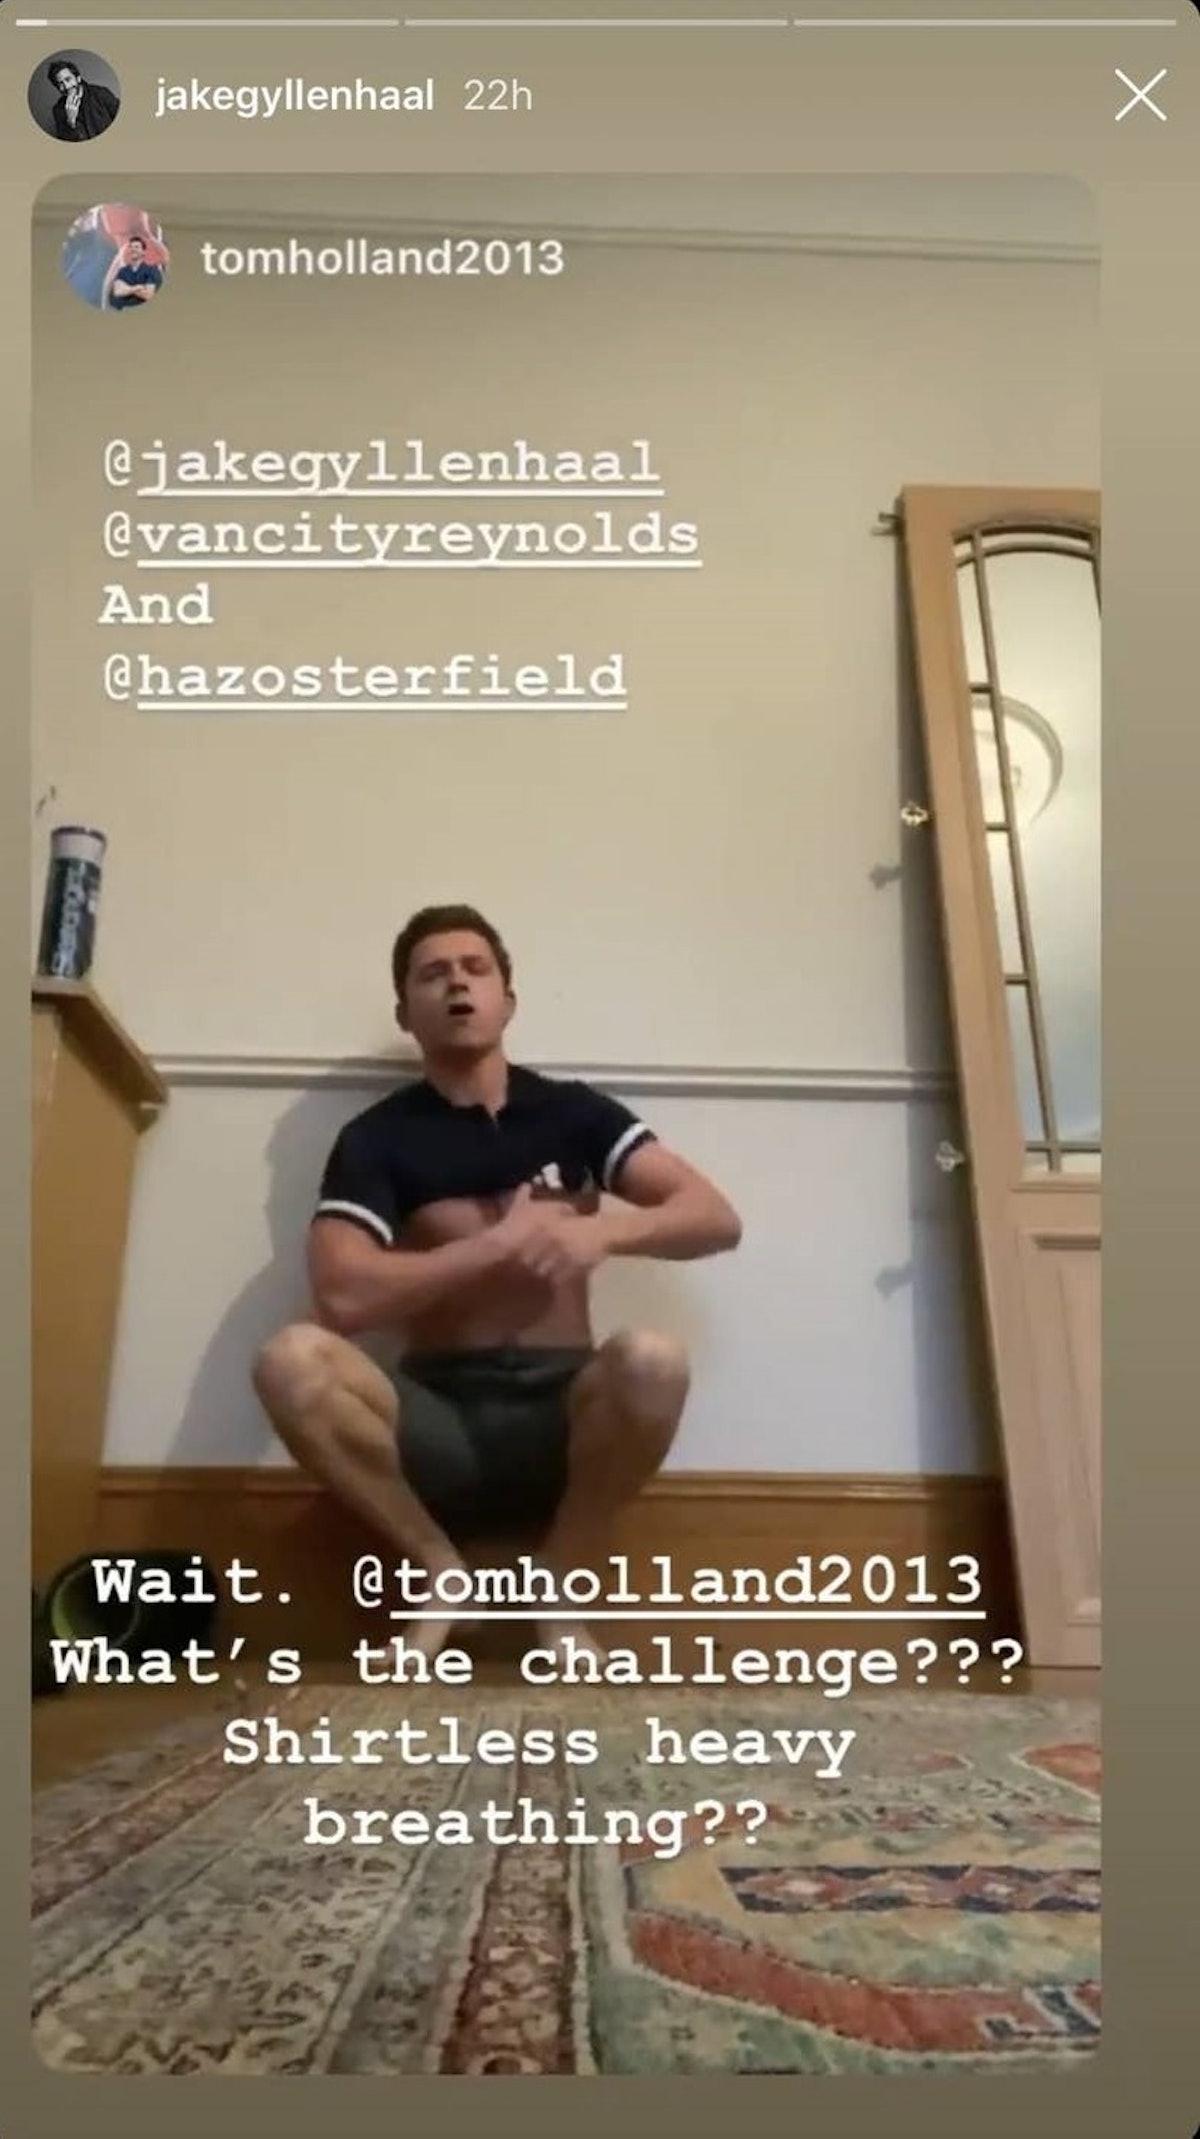 Tom Holland's shirtless handstand Instagram challenge is so weird.